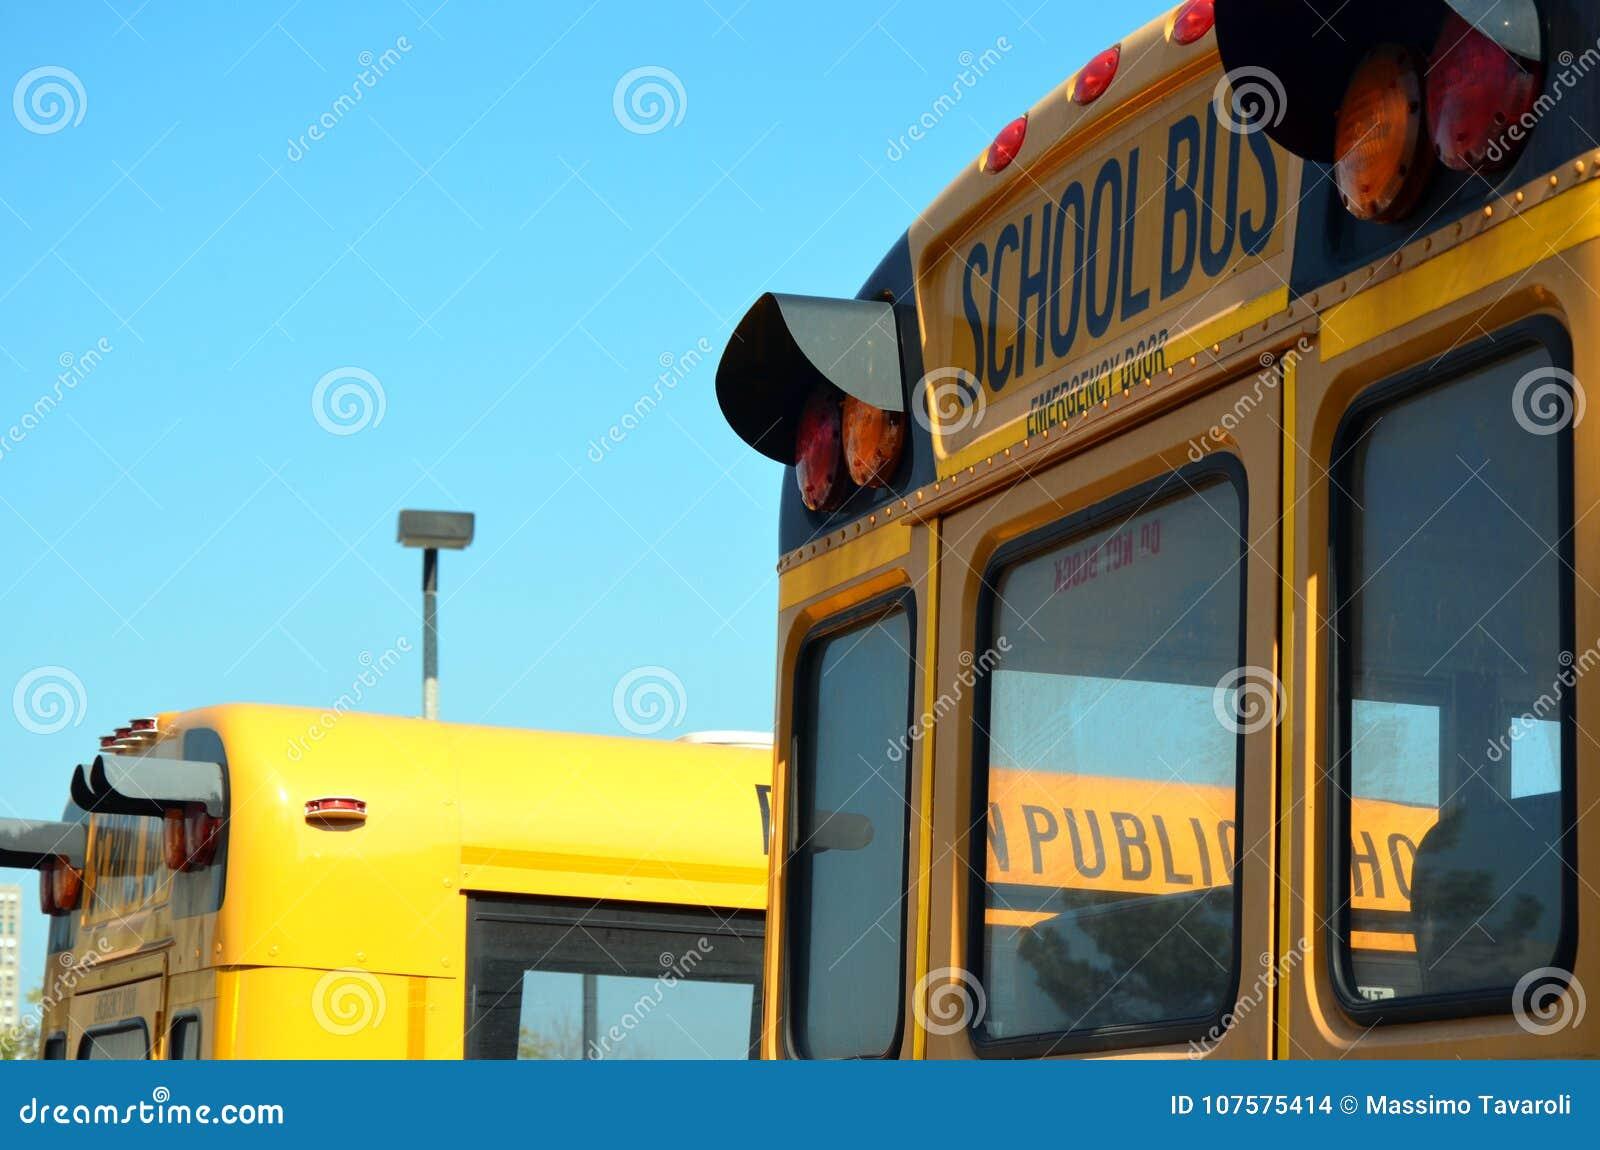 American school bus  stock photo  Image of american - 107575414